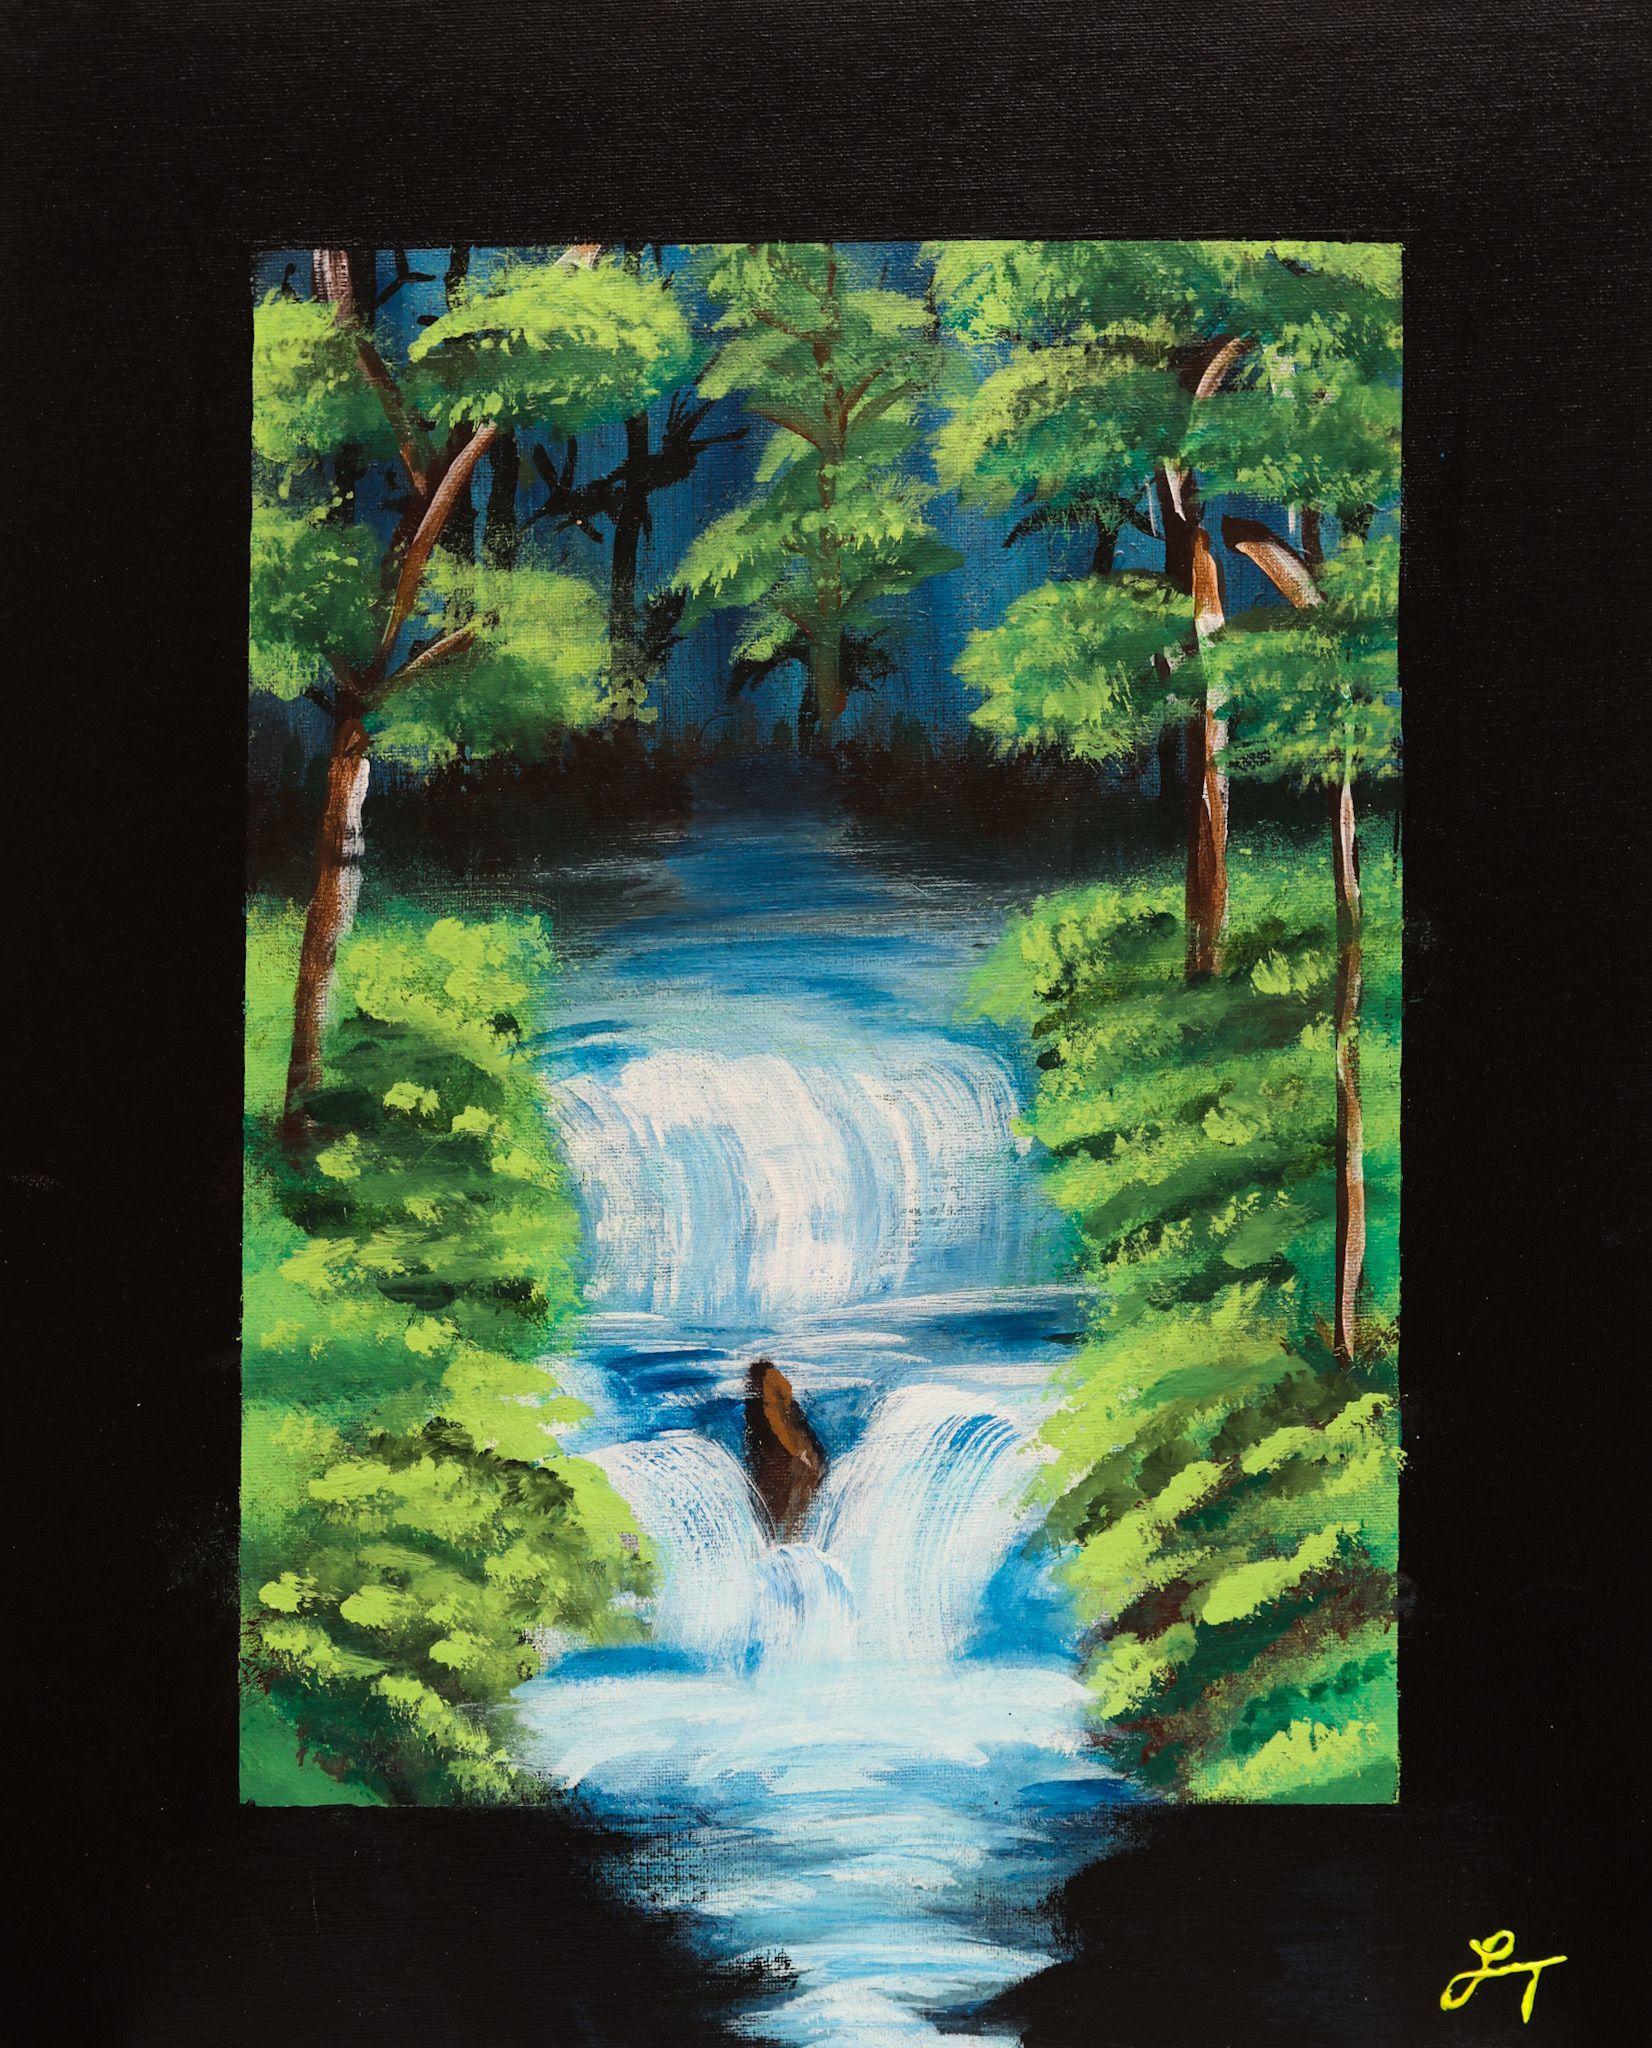 """Waterfall"" - Lesly Trelfa"